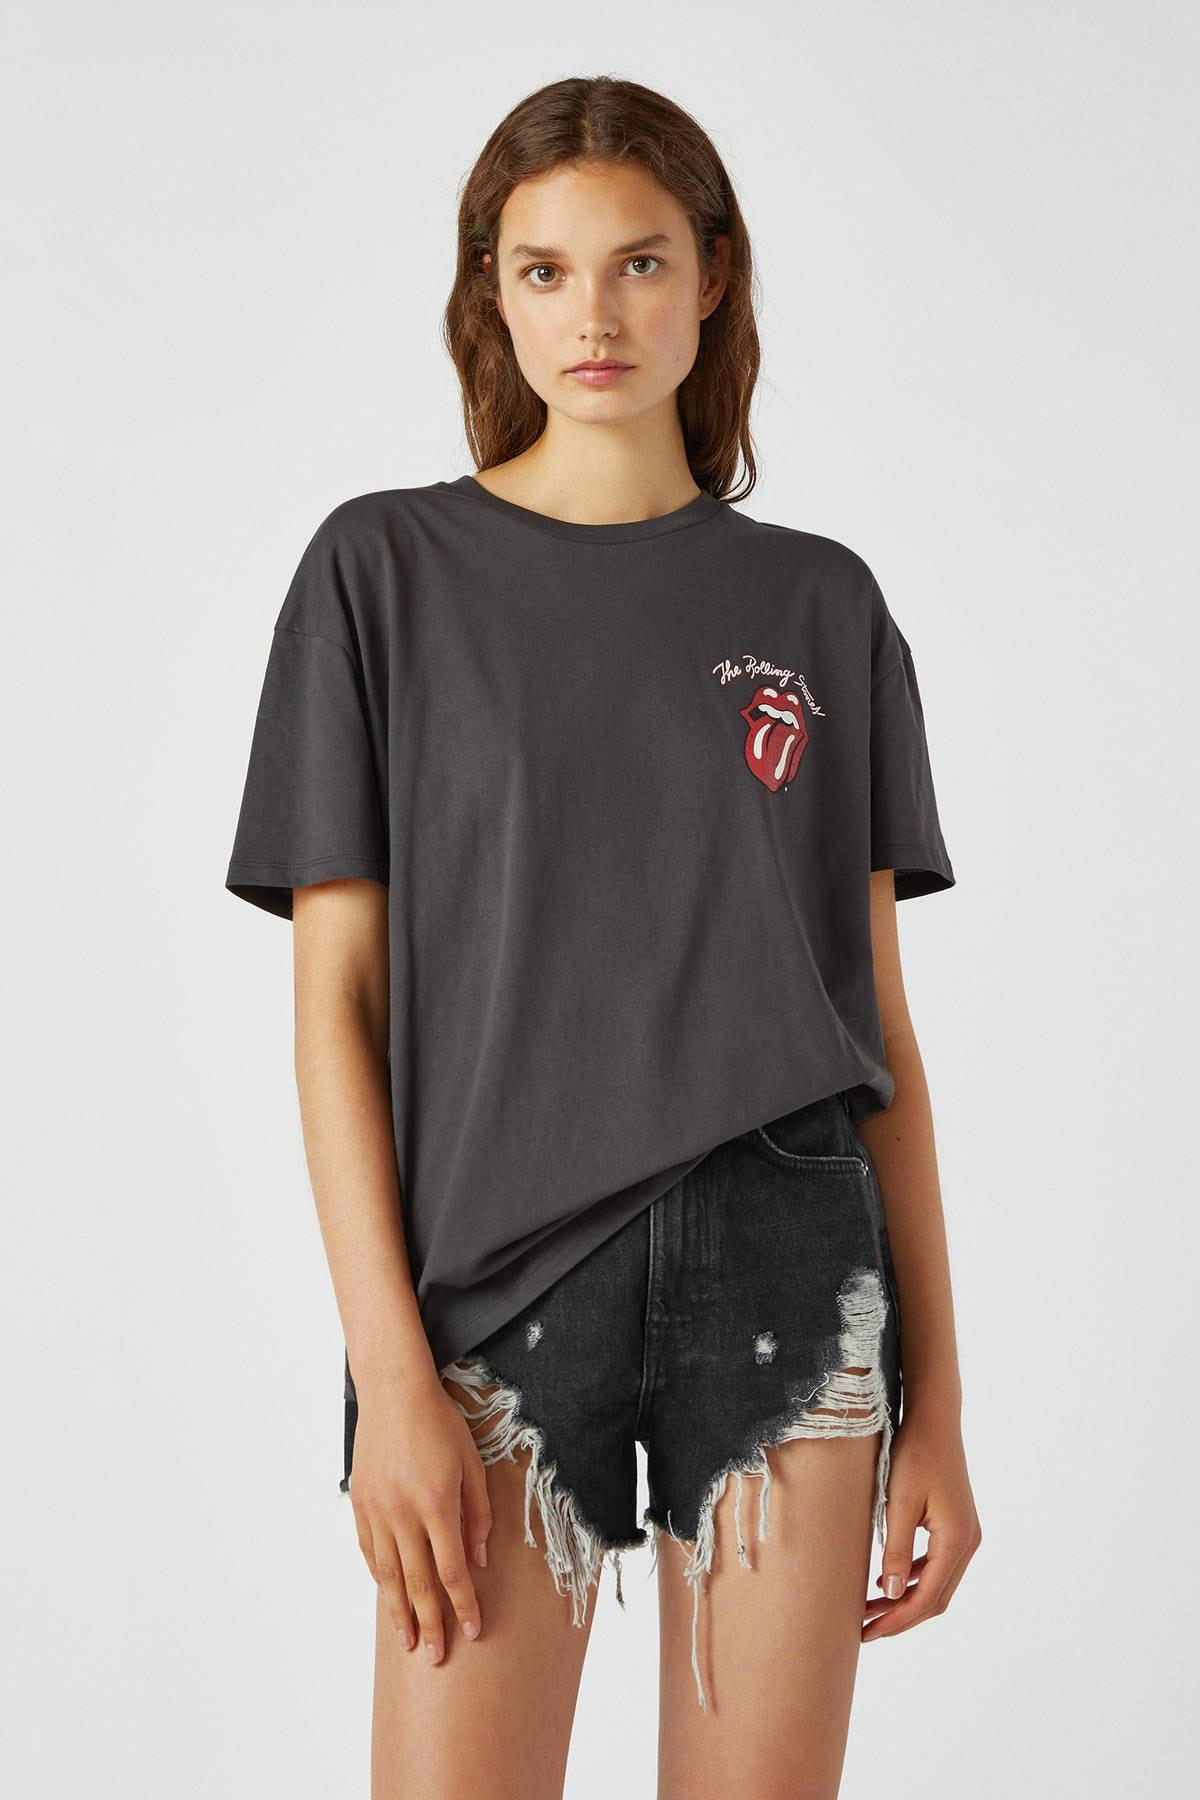 Pull & Bear Kadın Antrasit Gri Gri The Rolling Stones T-Shirt 09247306 0